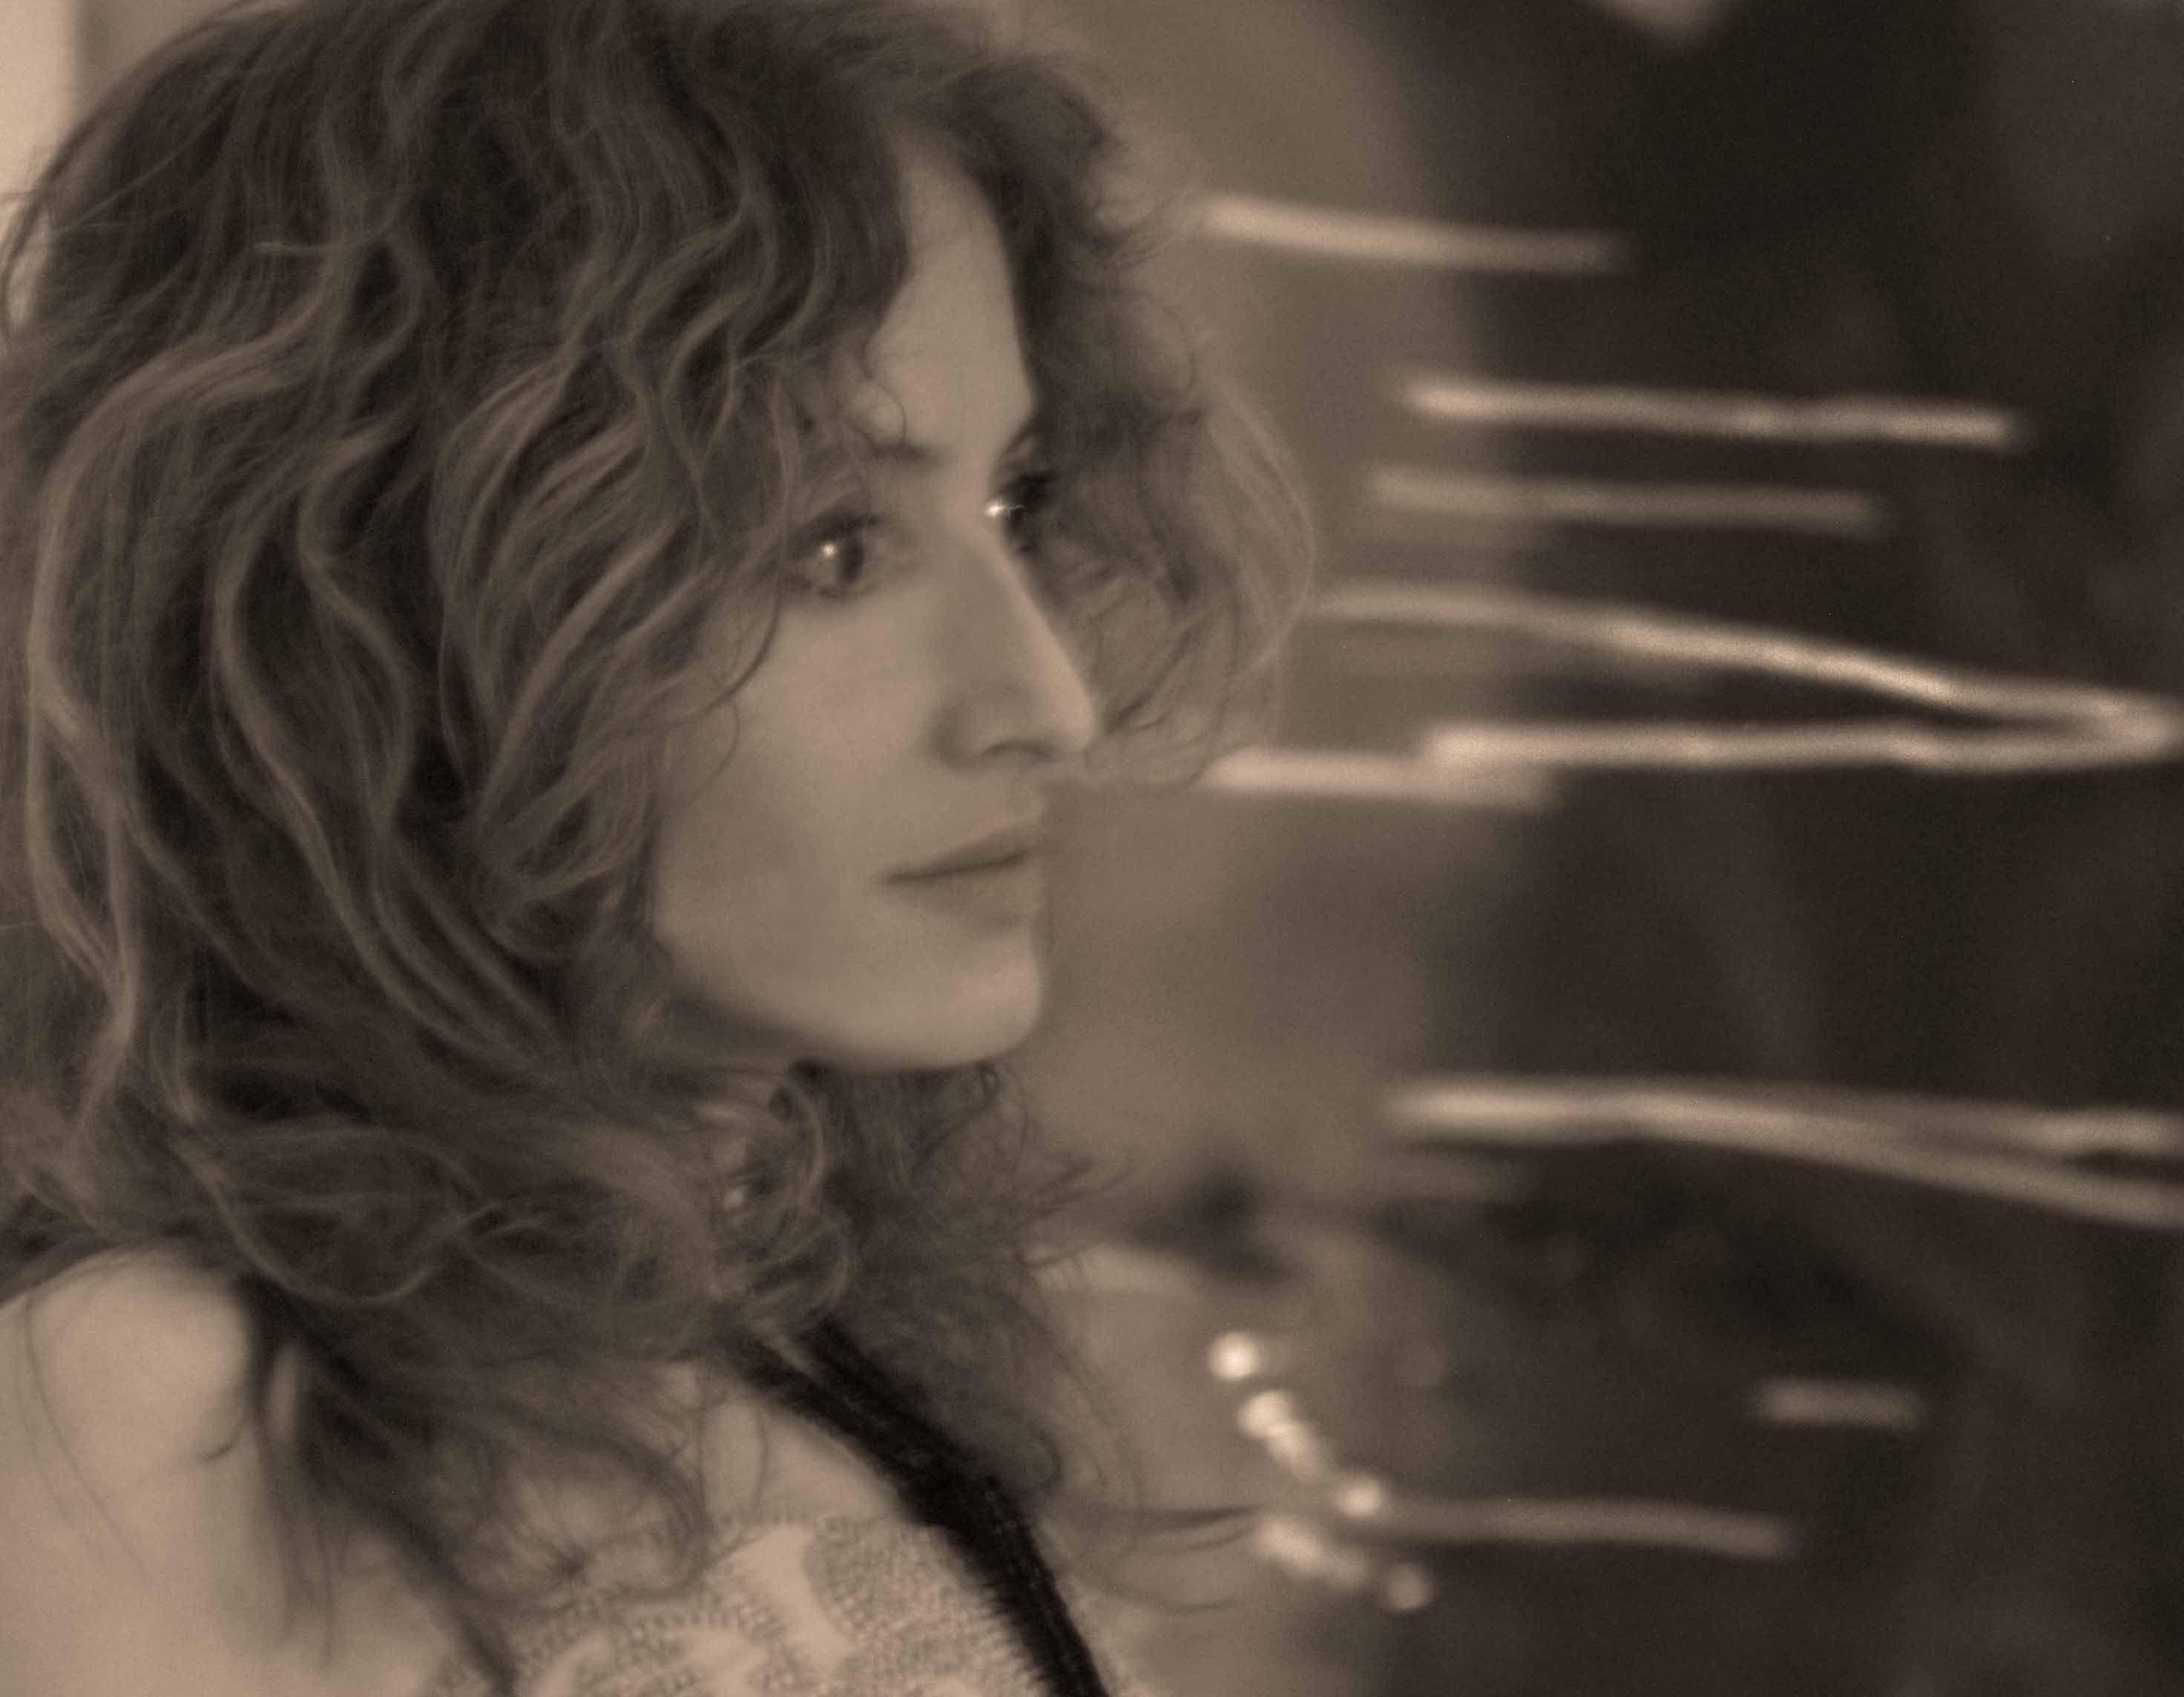 Rositza Stanisjewa